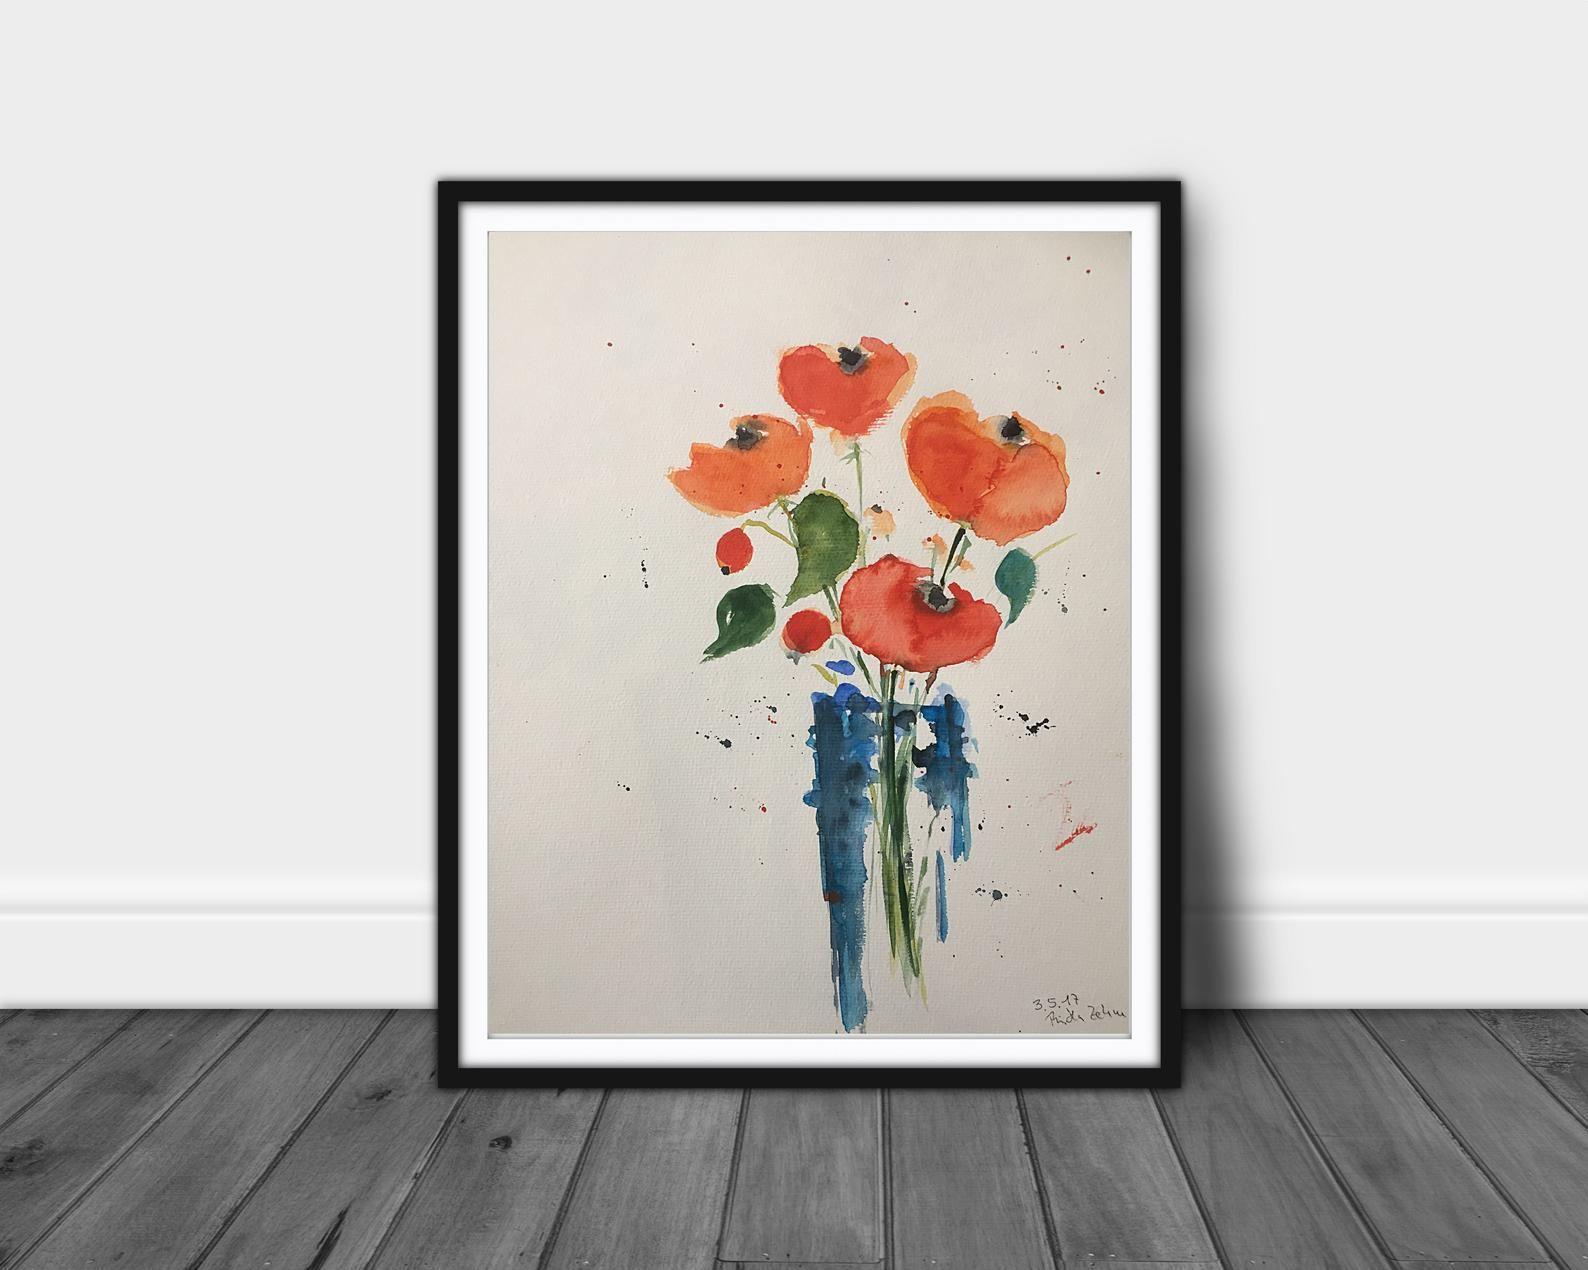 Original Aquarell Aquarellmalerei Bild Kunst Mohnblumen Blumen Abstrakte Malerei Home Decor Art On Stuff V 2019 G